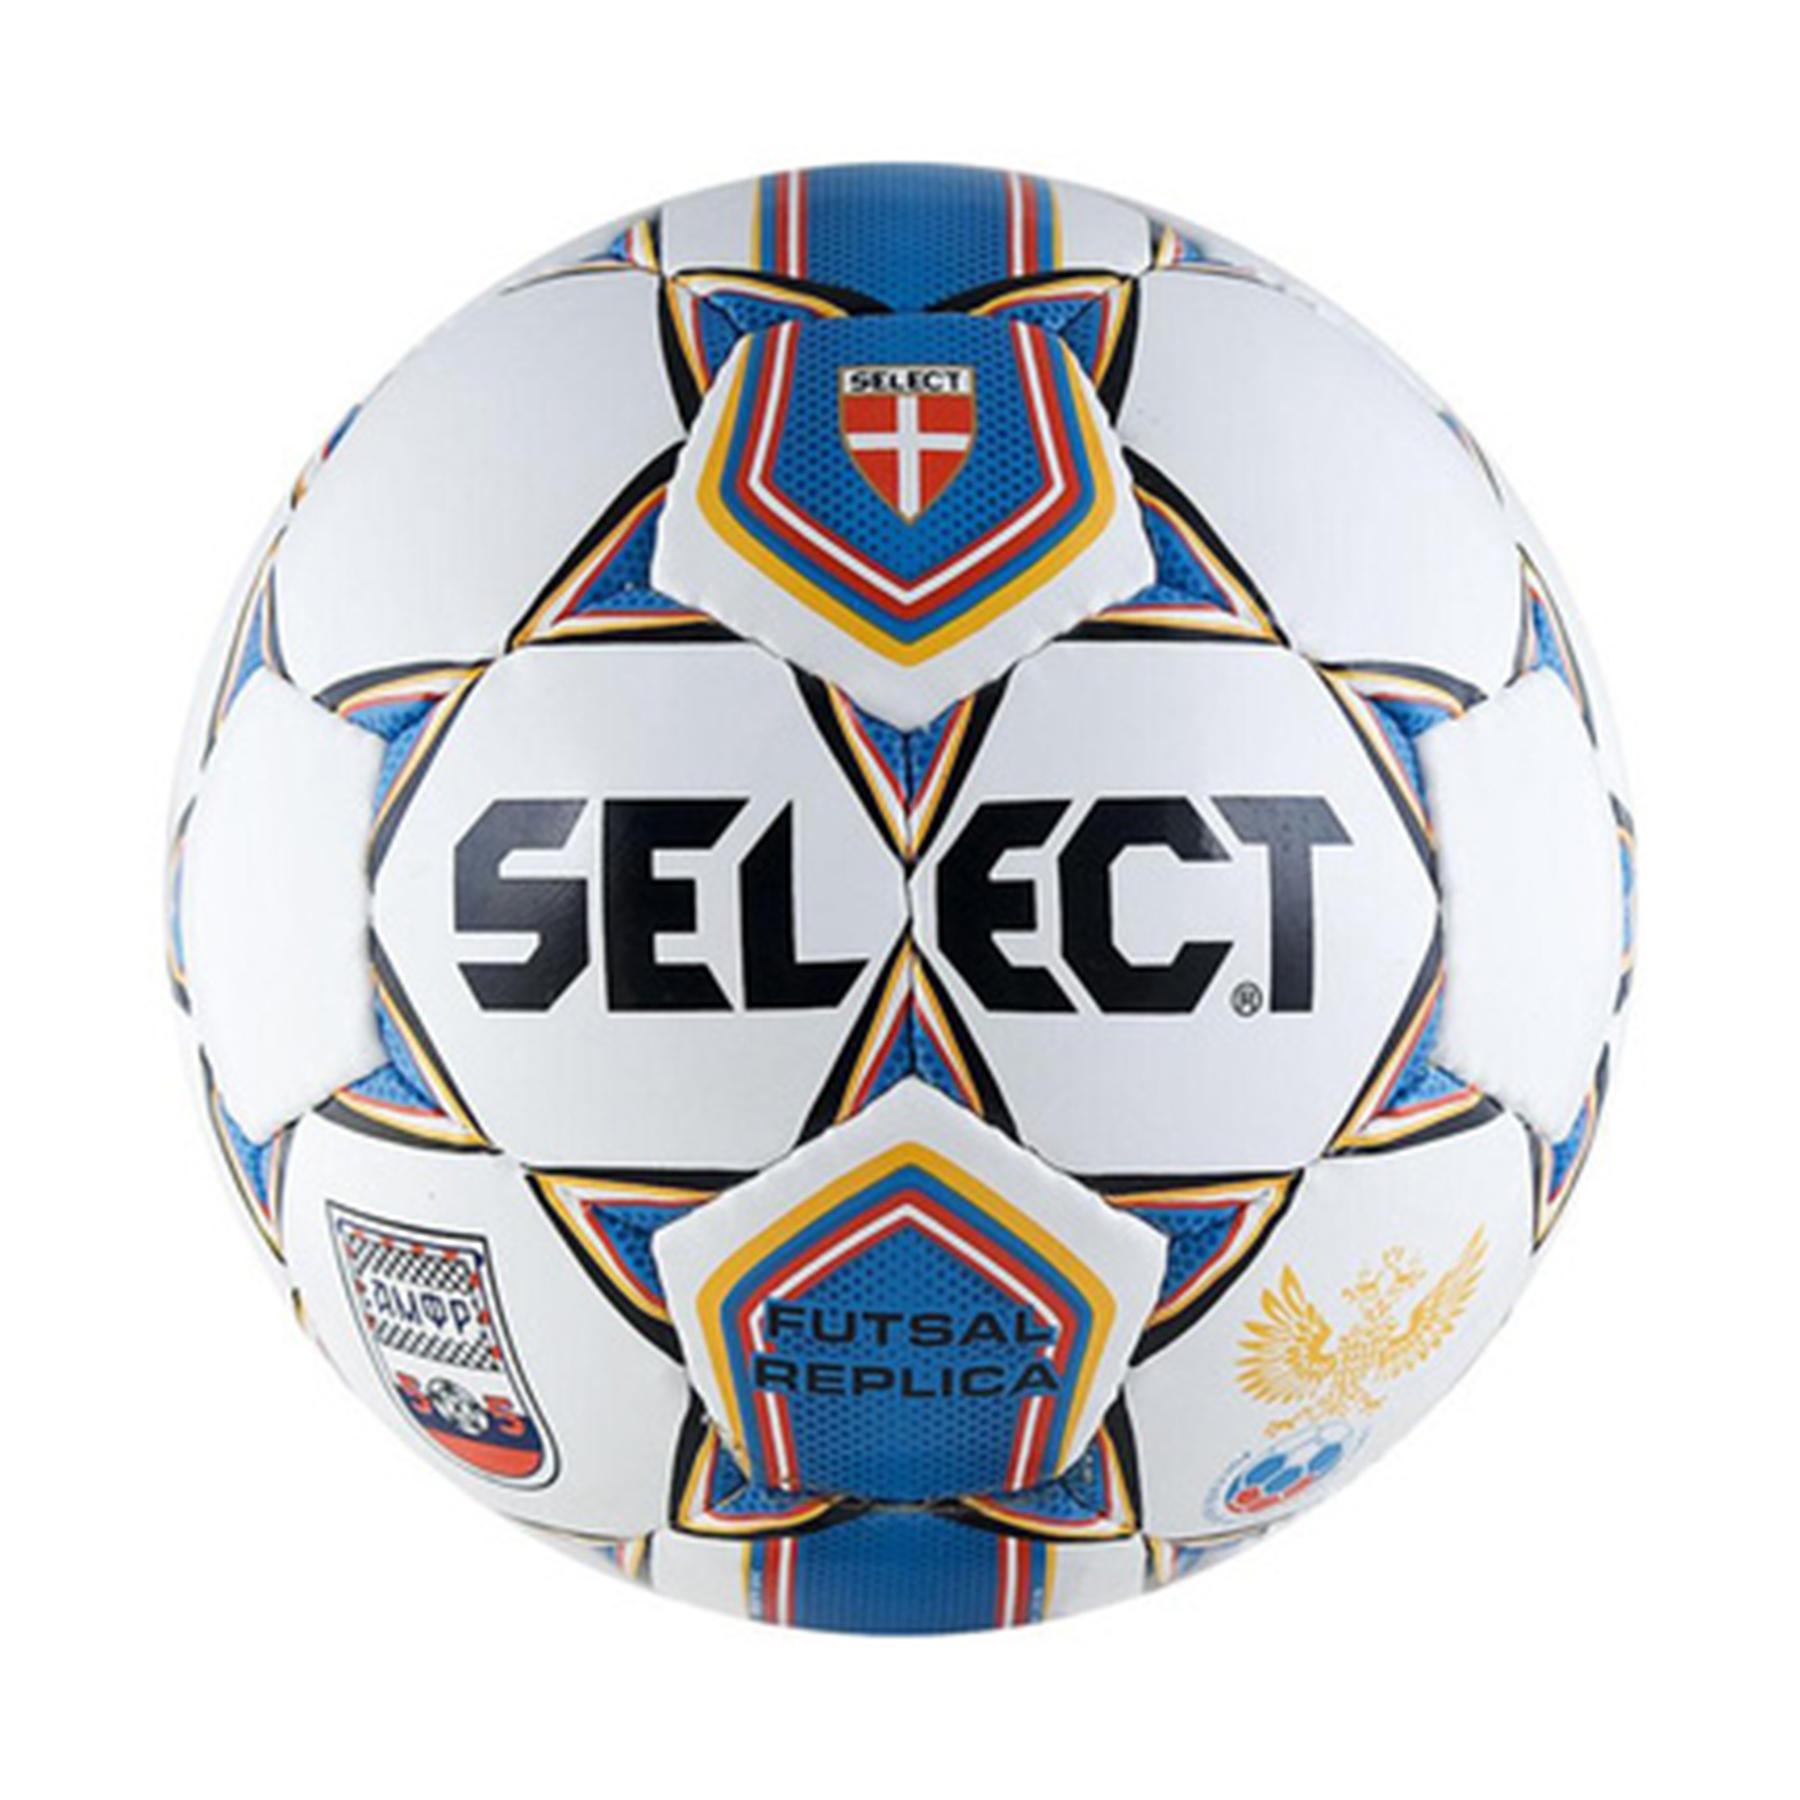 Мяч ф/б SELECT Futsal Replica 2012  №4 РФС  850608 белый